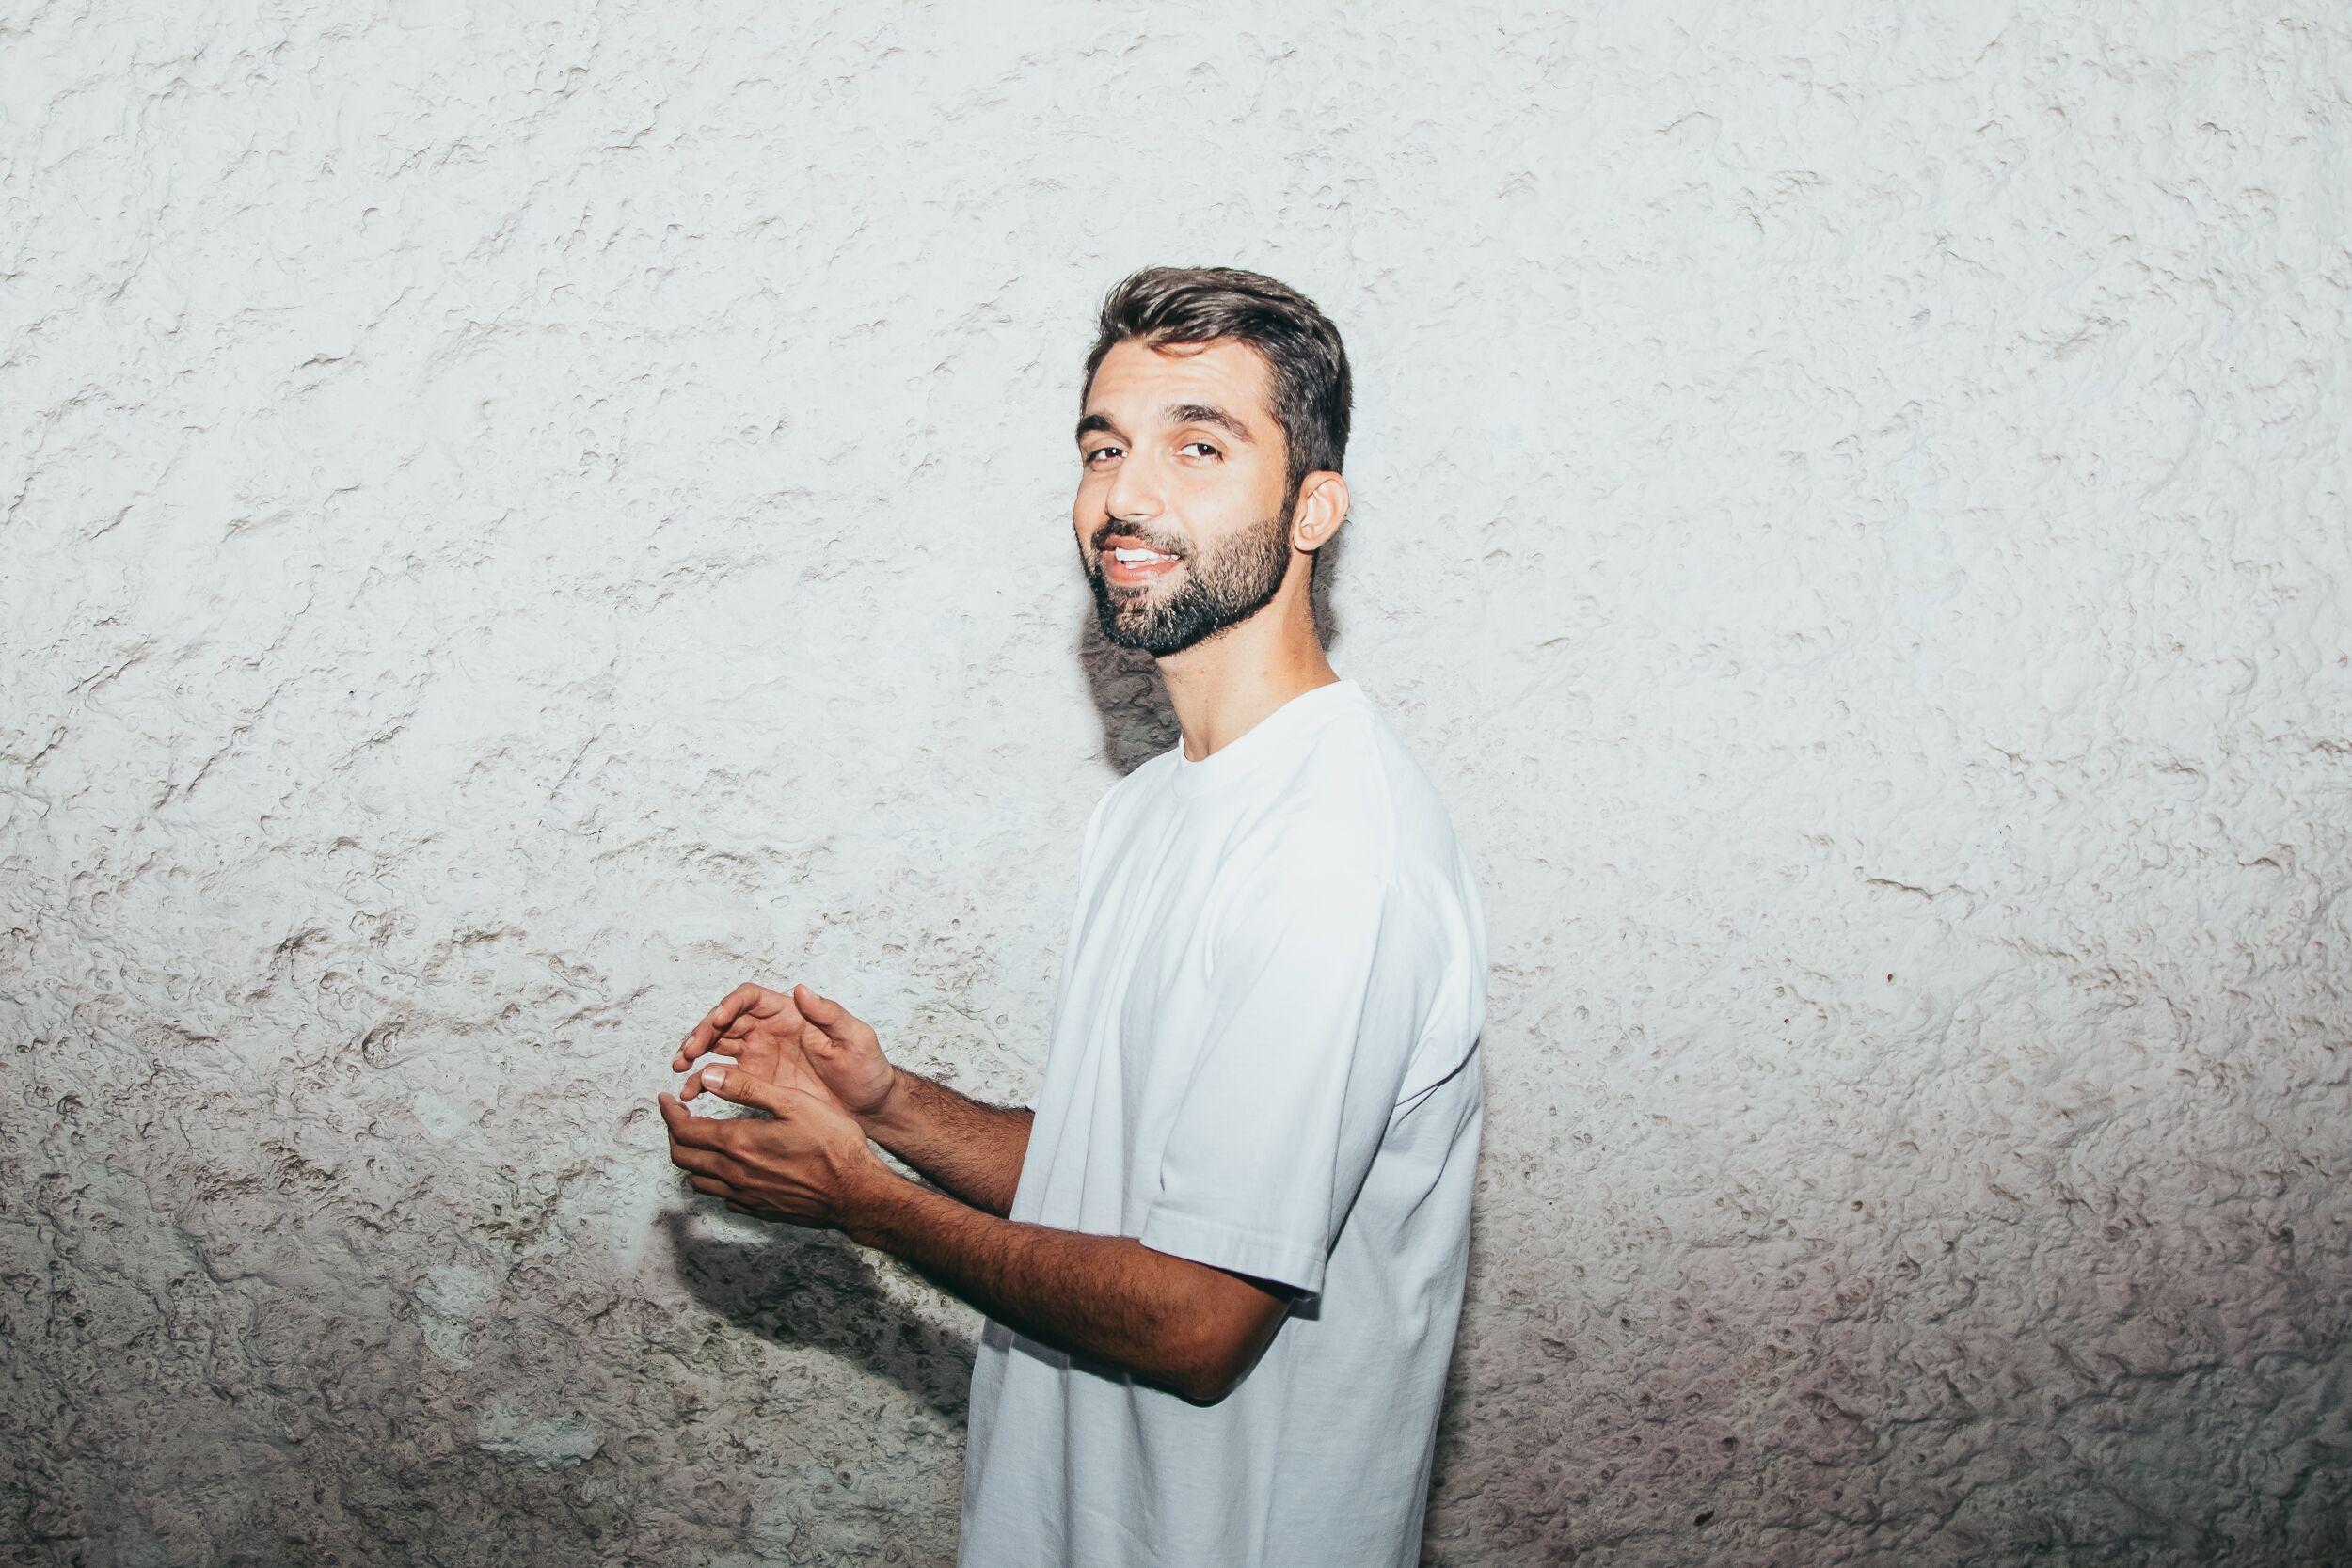 Mais brasileiro, Silva volta ao Lollapalooza sem 'tentar ser primo pobre do Frank Ocean'